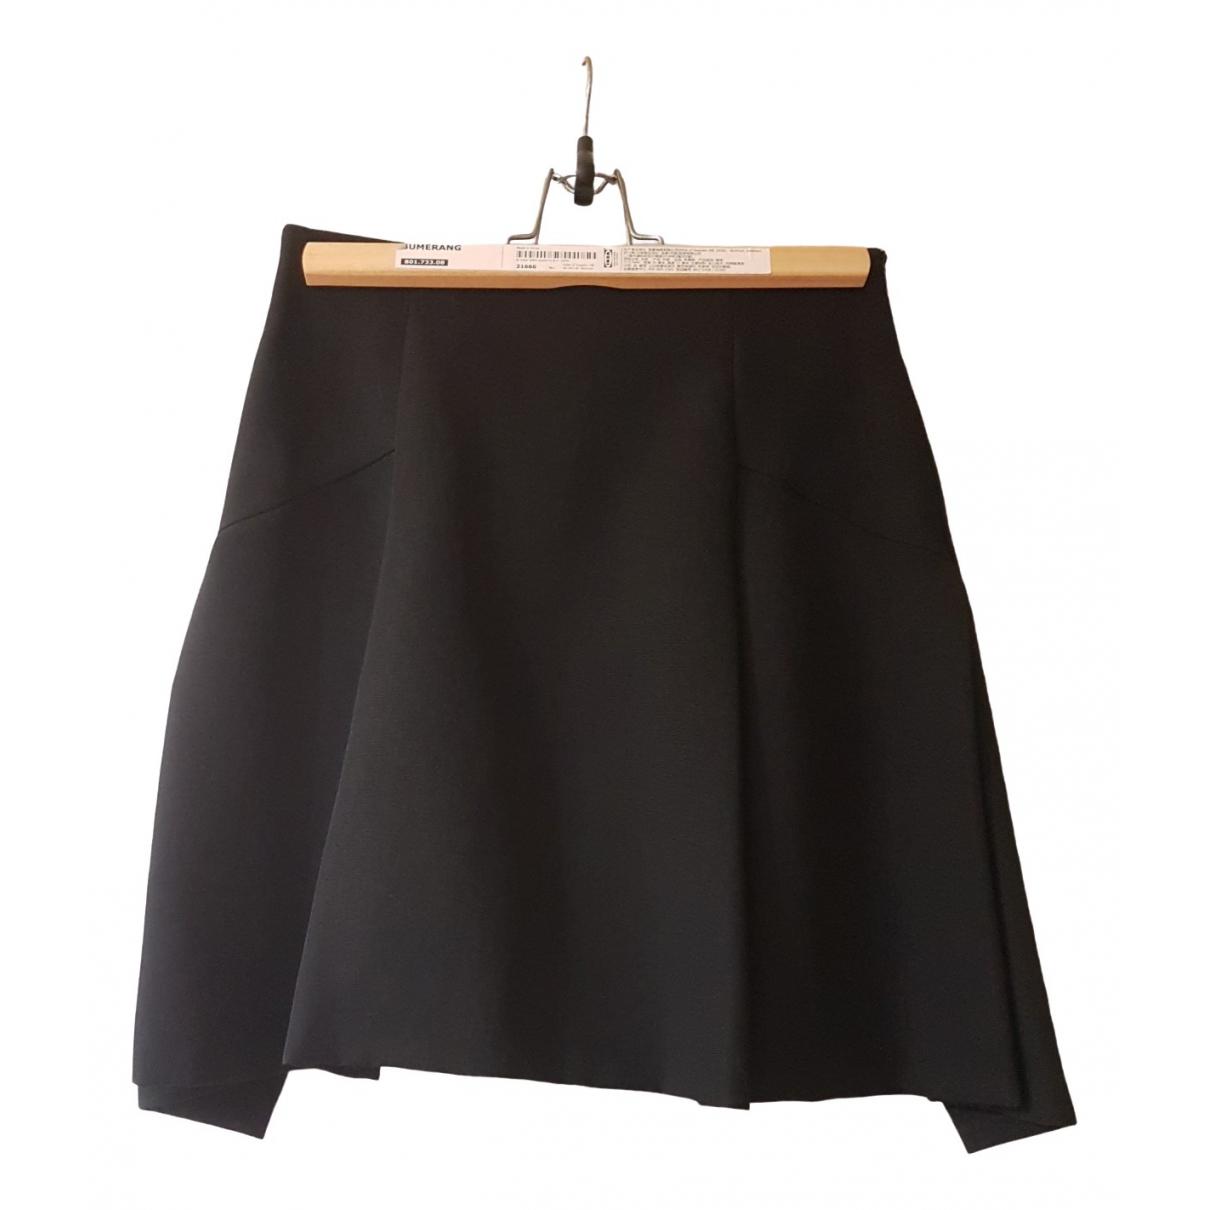 Giuliano Fujiwara - Jupe   pour femme en lin - noir